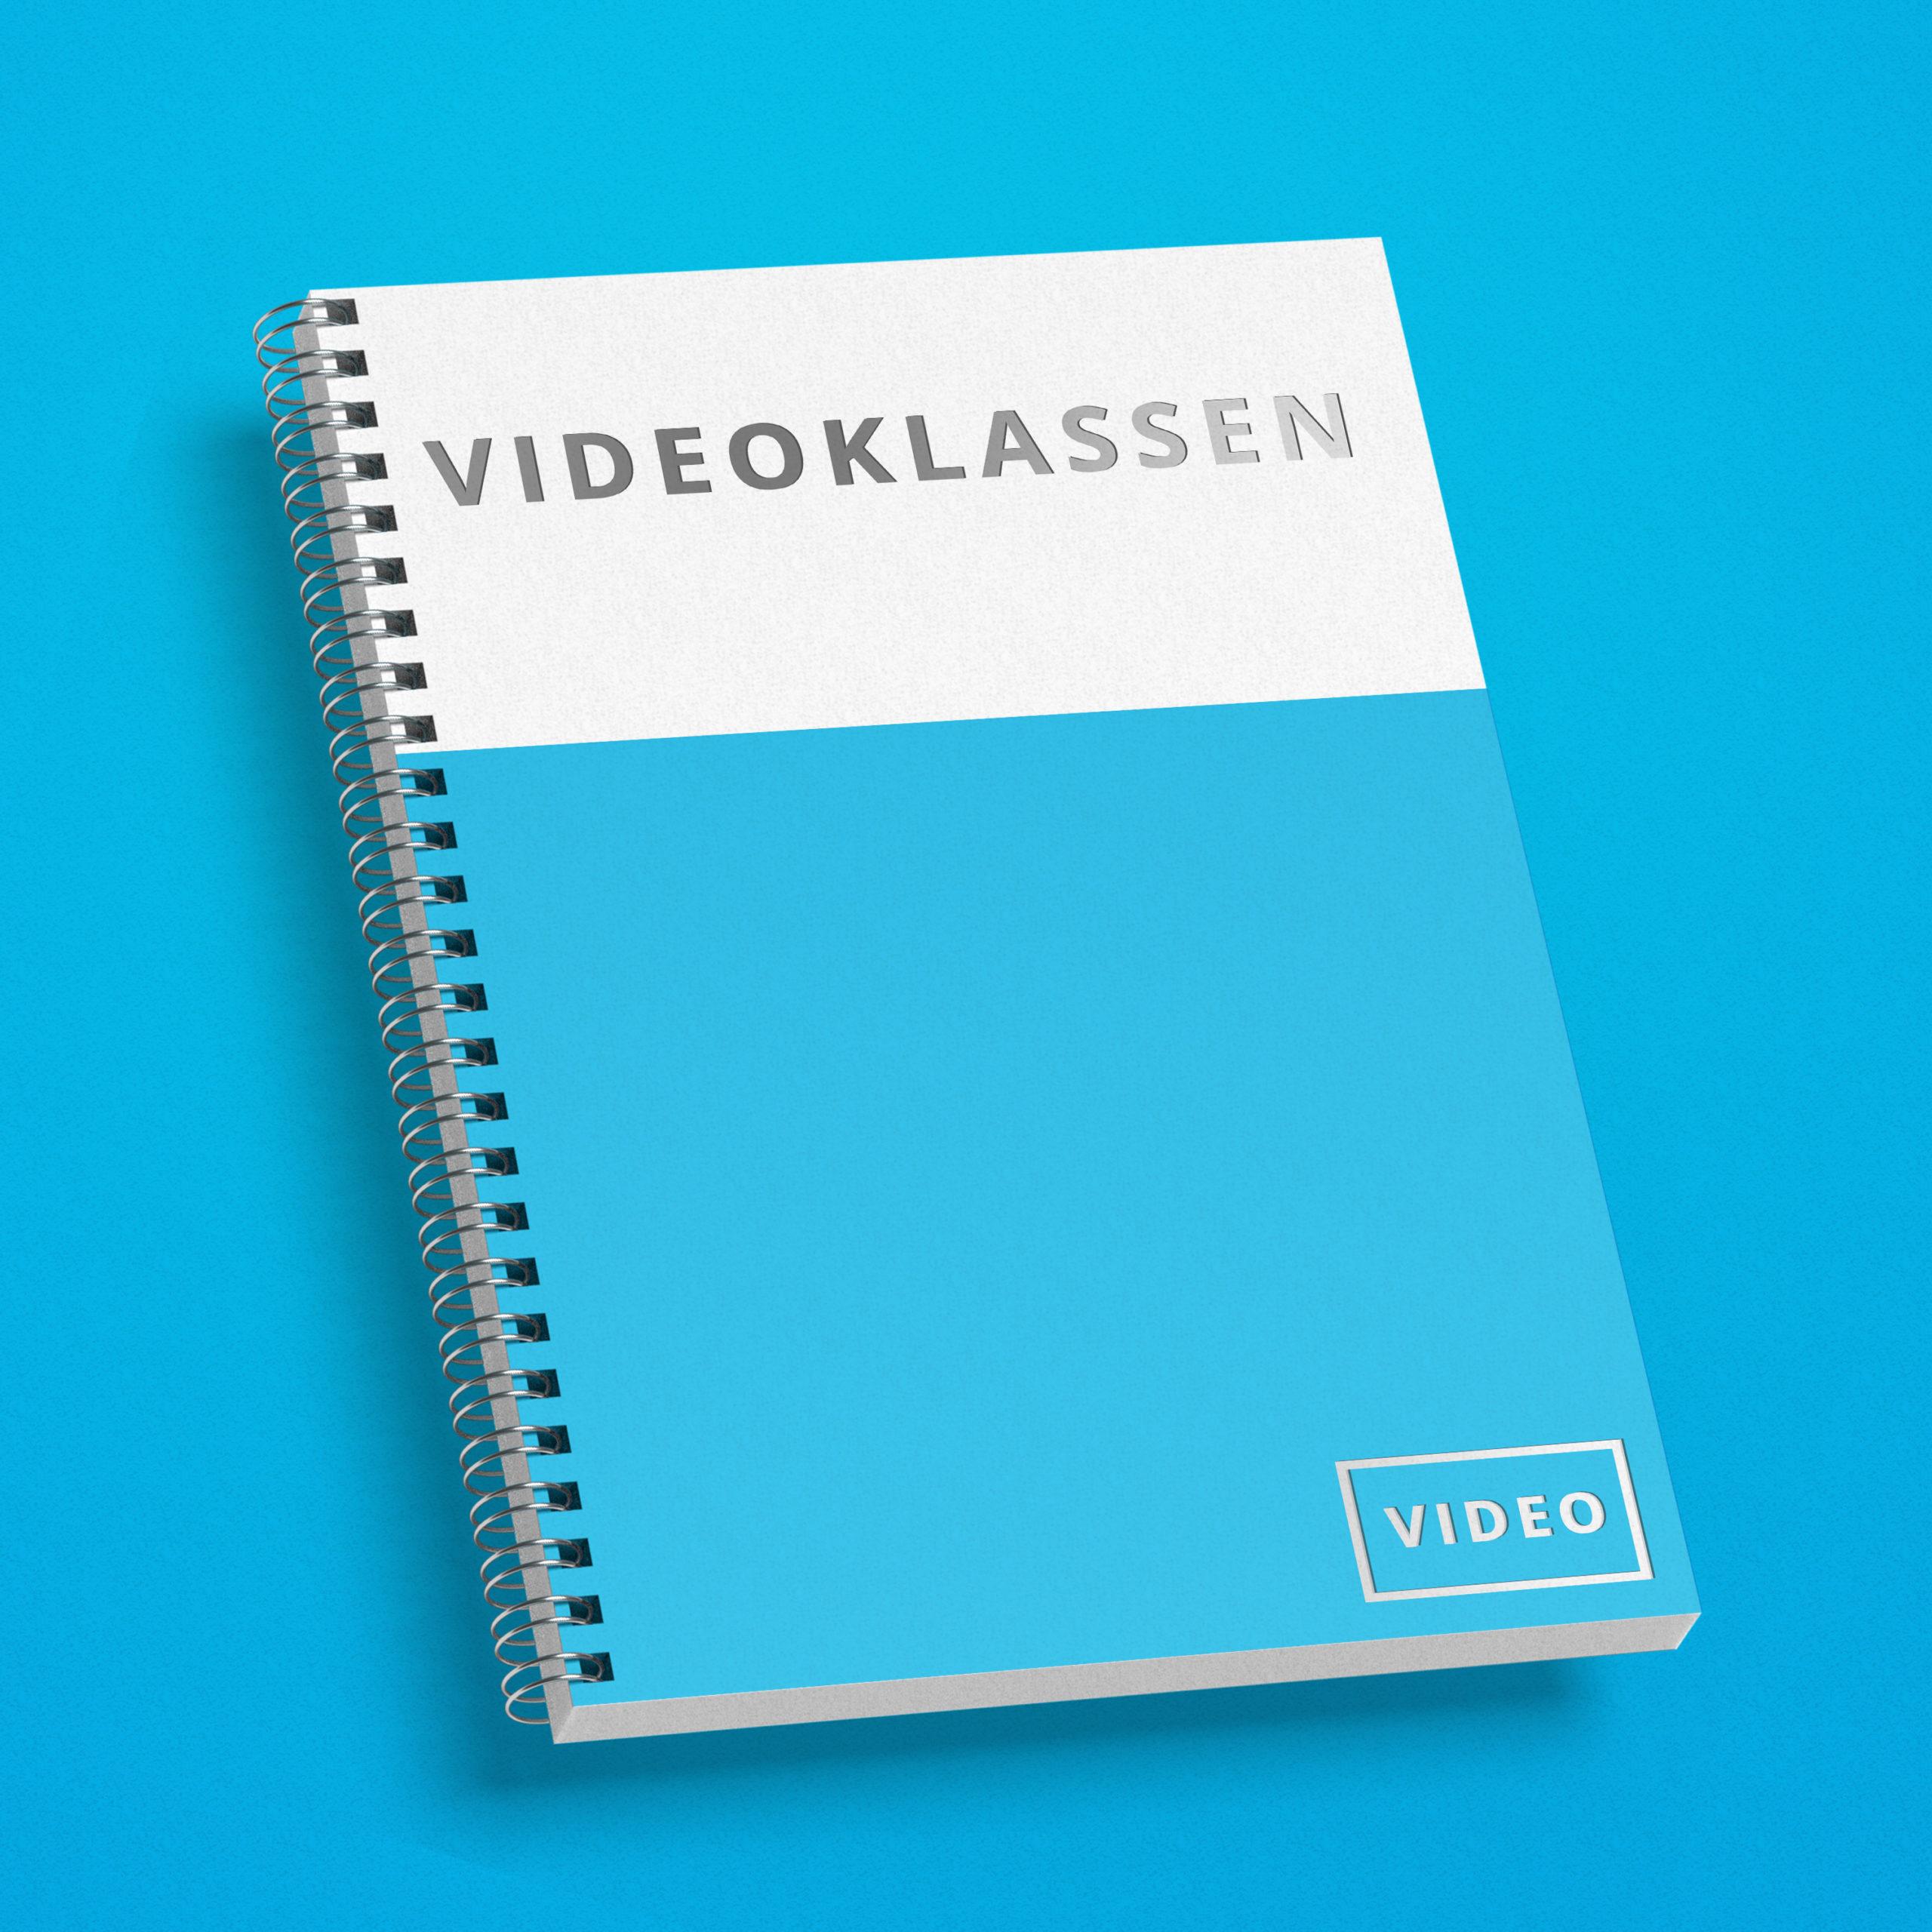 Videoklassen